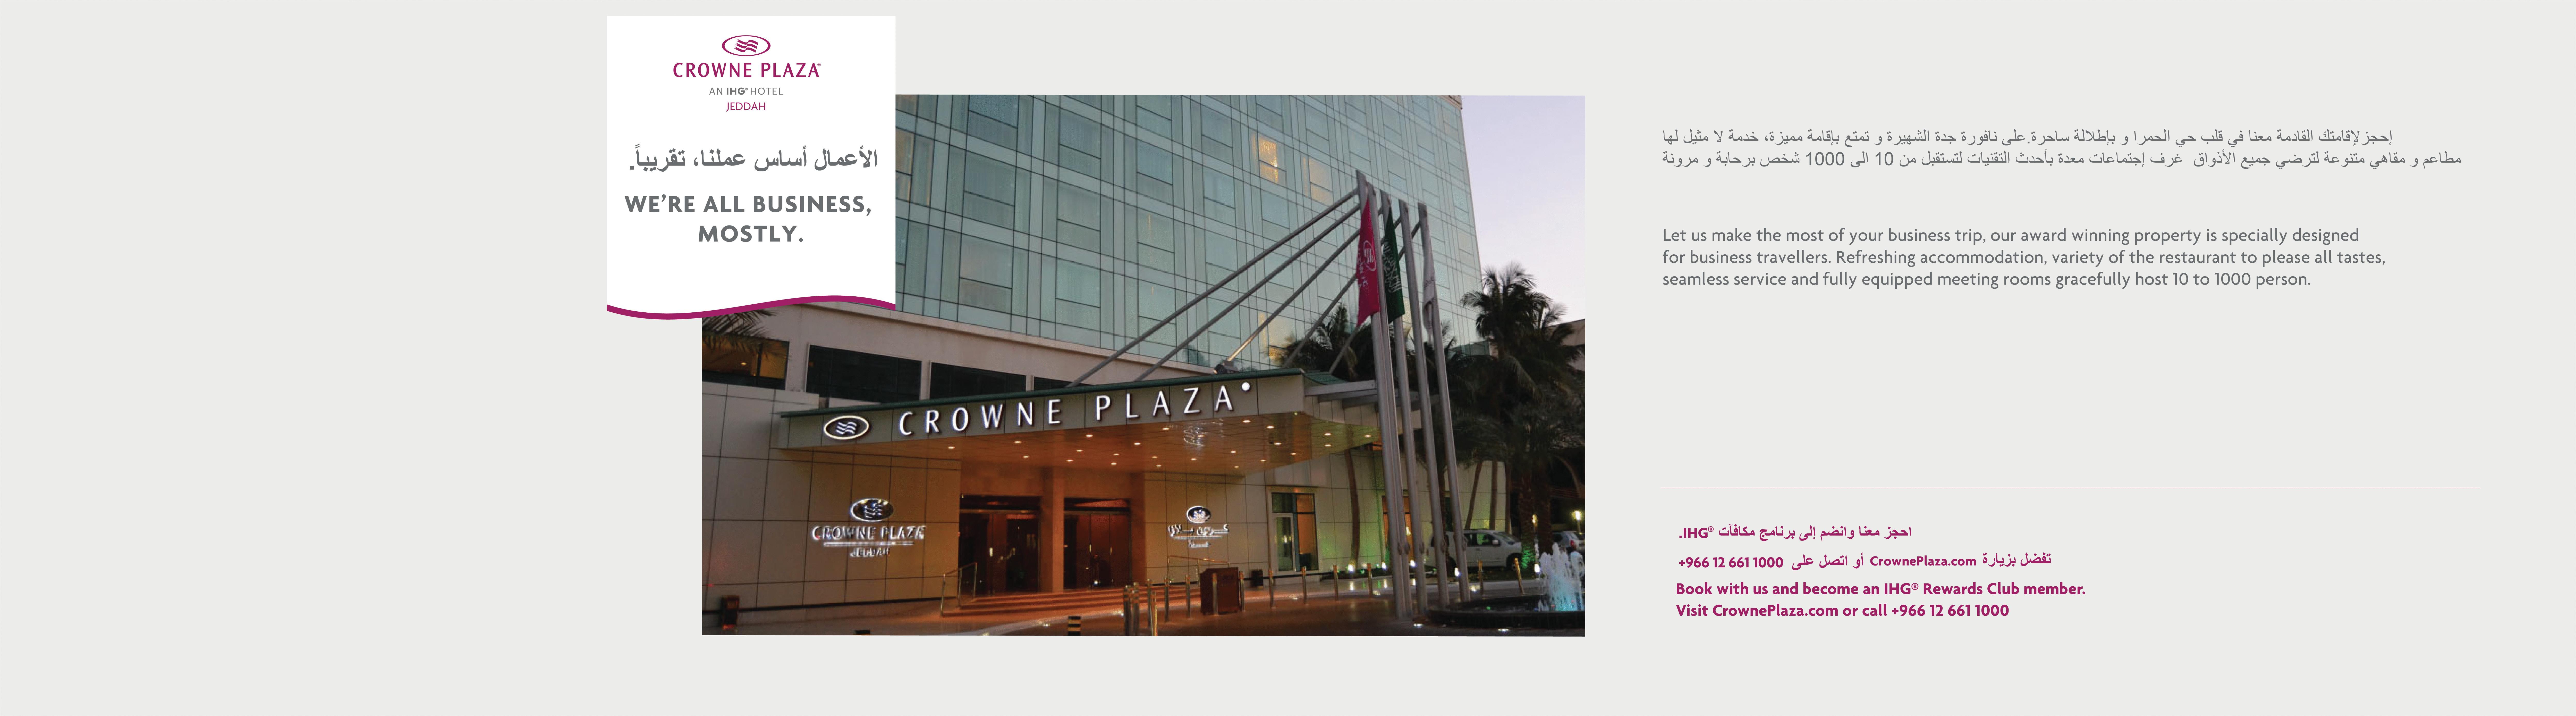 Crowne Plaza Jeddah Hotel | LinkedIn